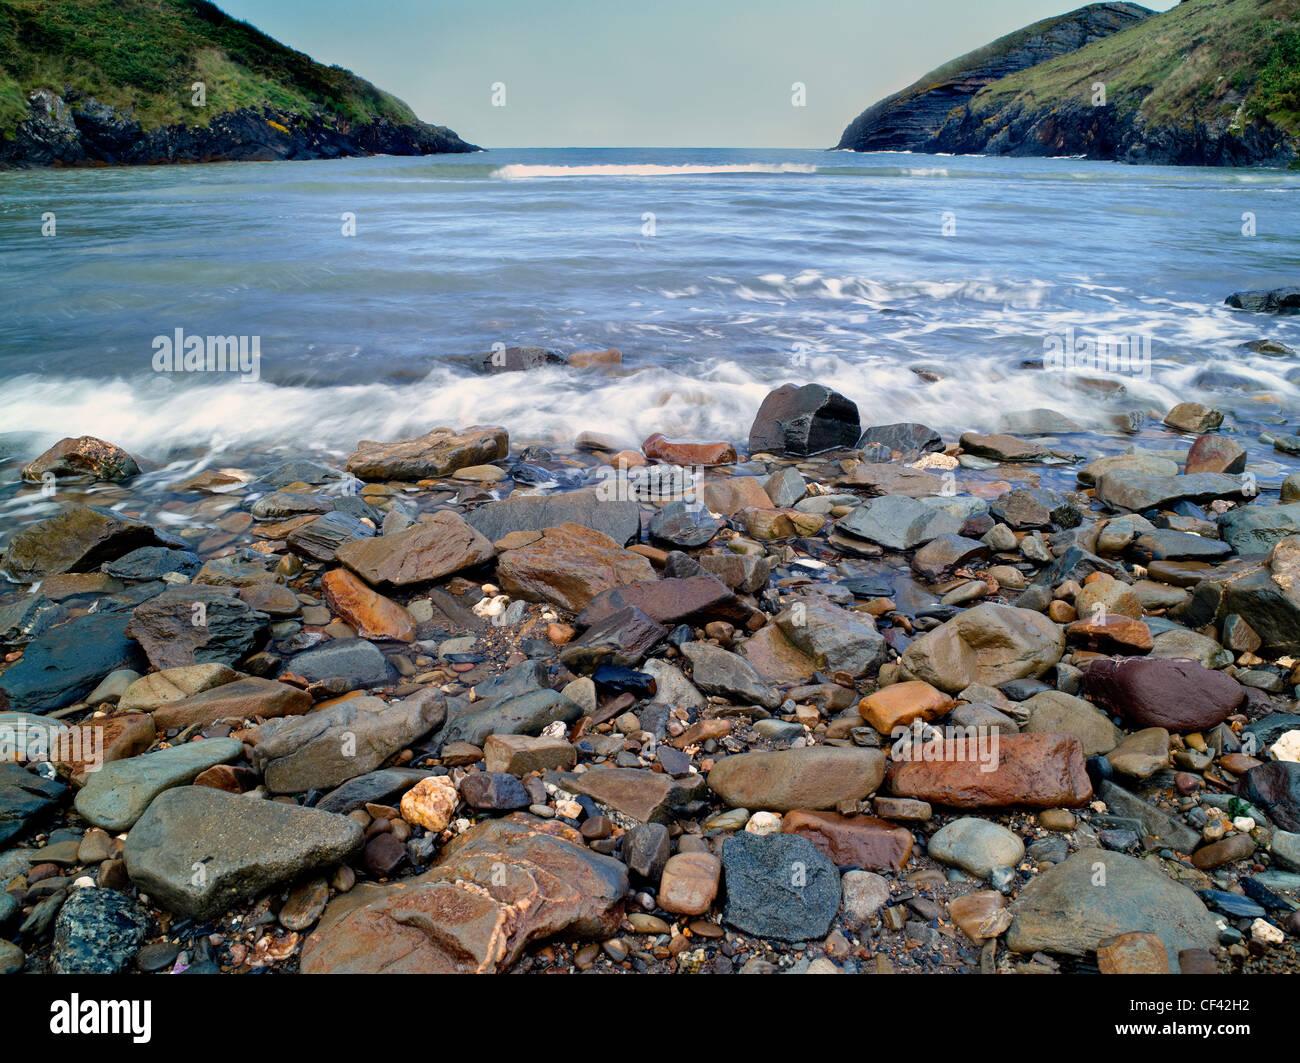 View out across pebble-strewn Ceibwr Bay towards the Irish Sea. - Stock Image